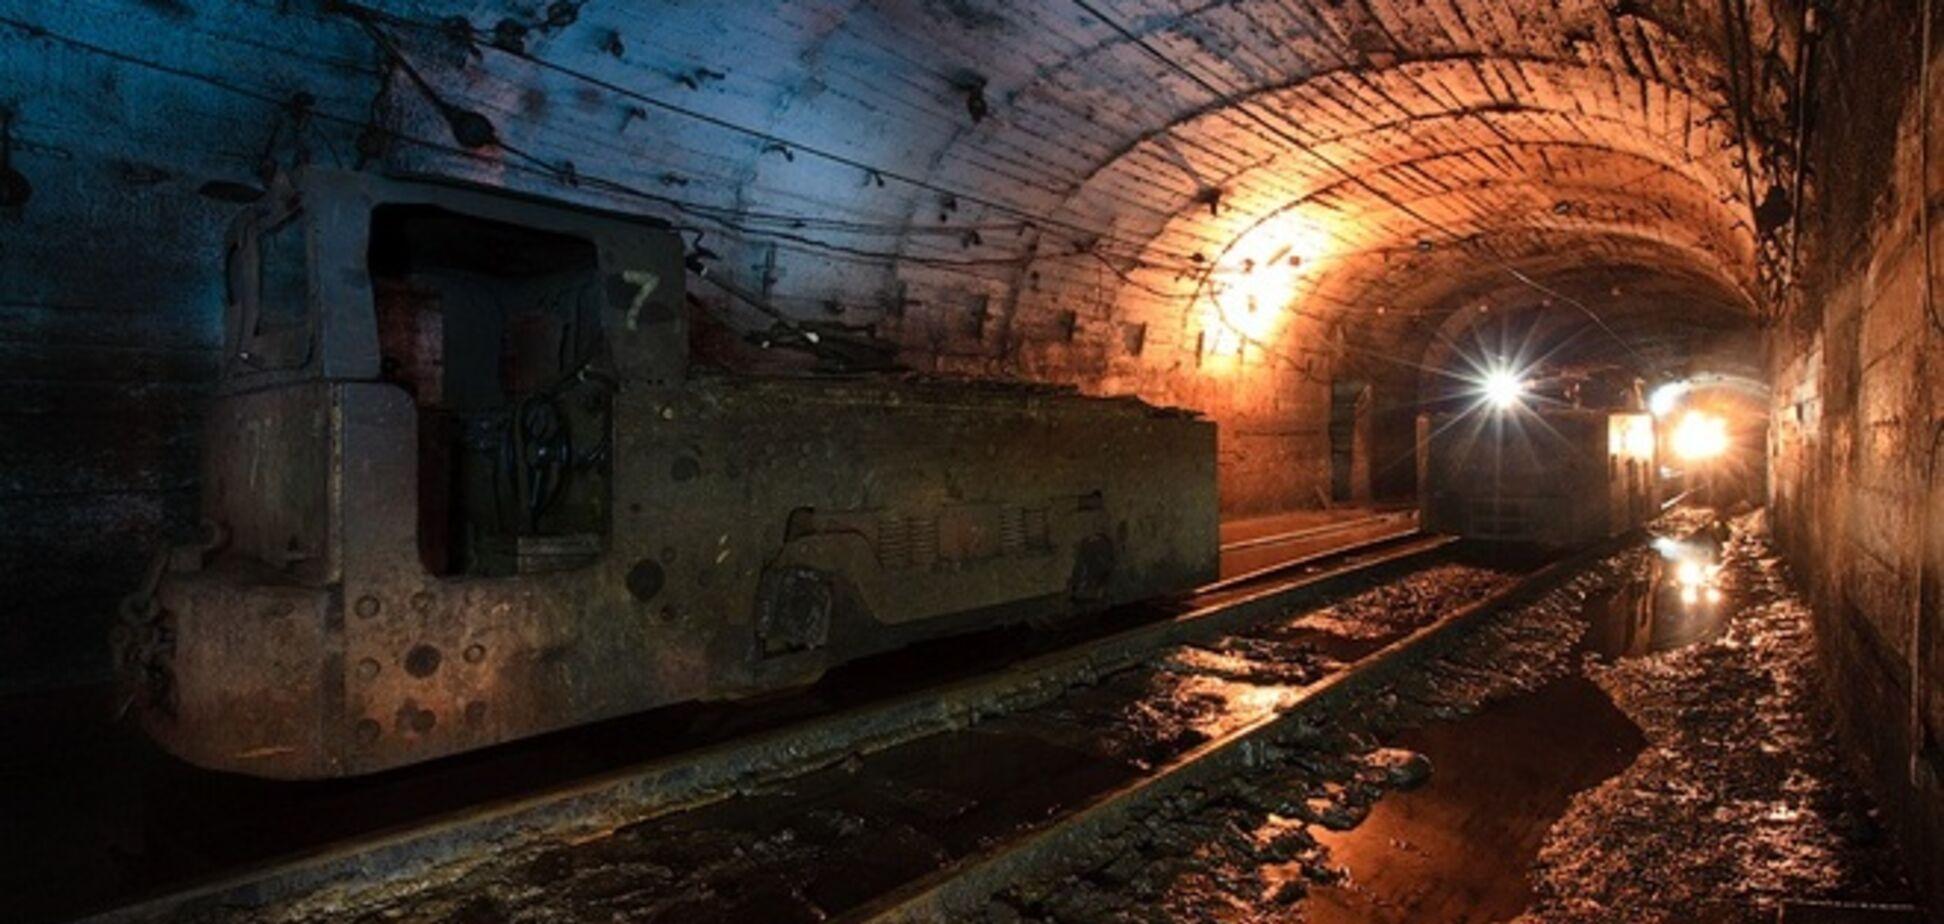 На Донетчине в шахте произошел взрыв газа, судьба девяти горняков неизвестна